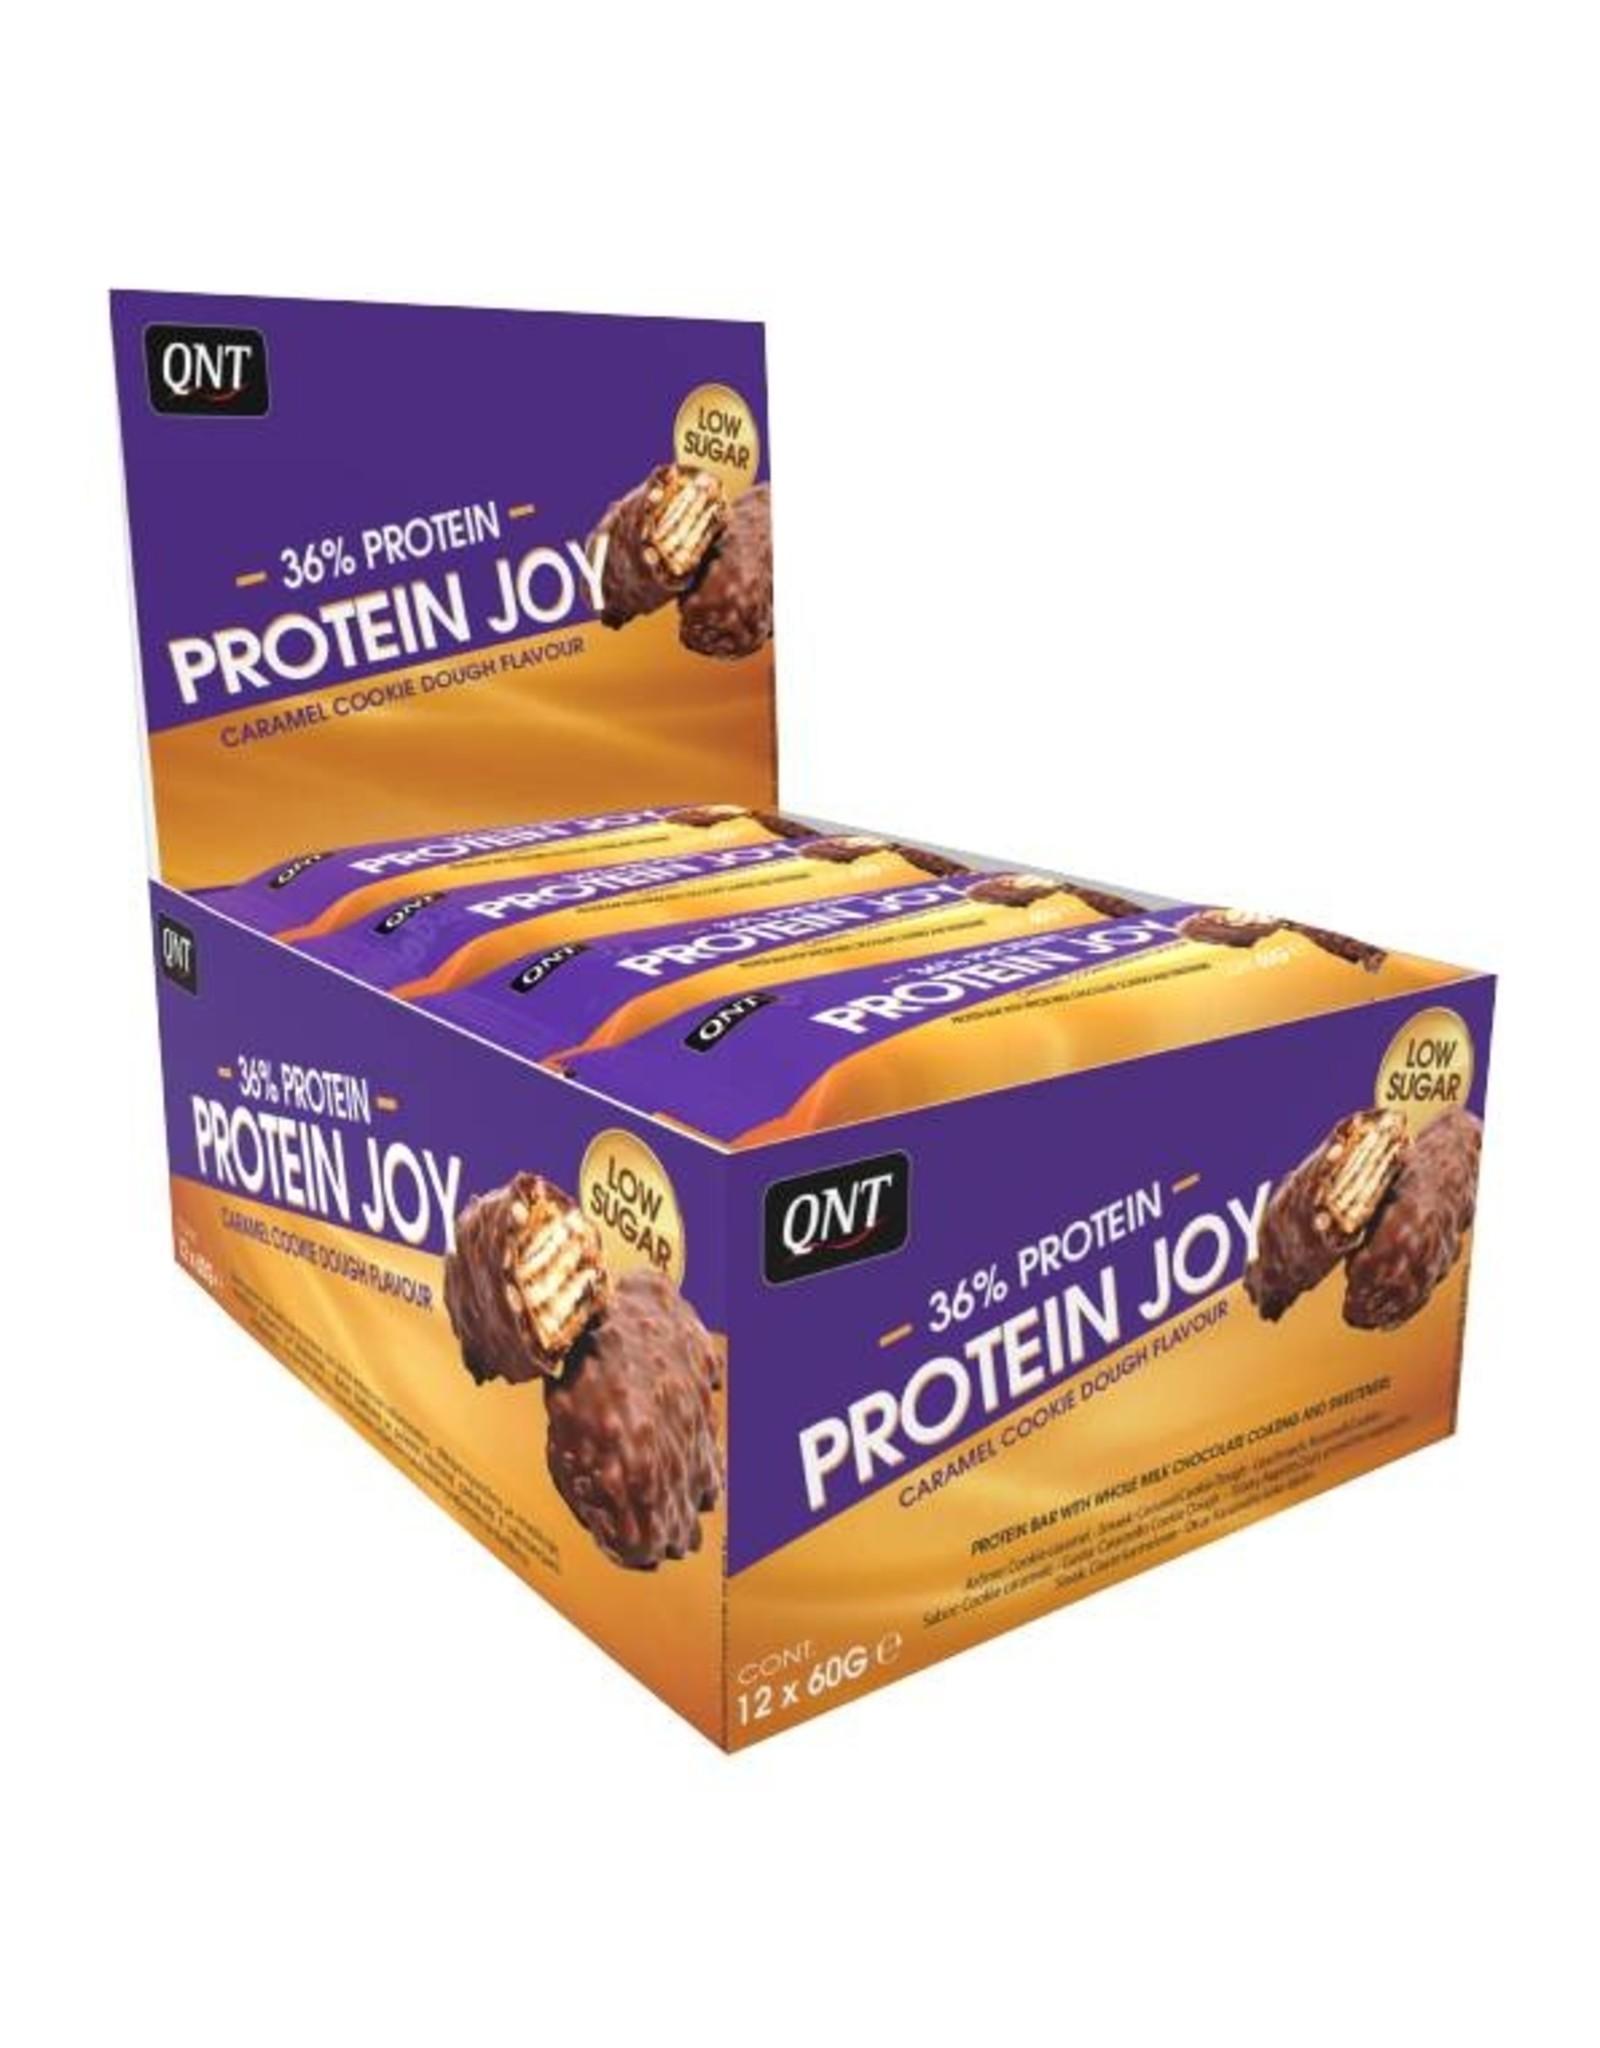 QNT Protein Joy